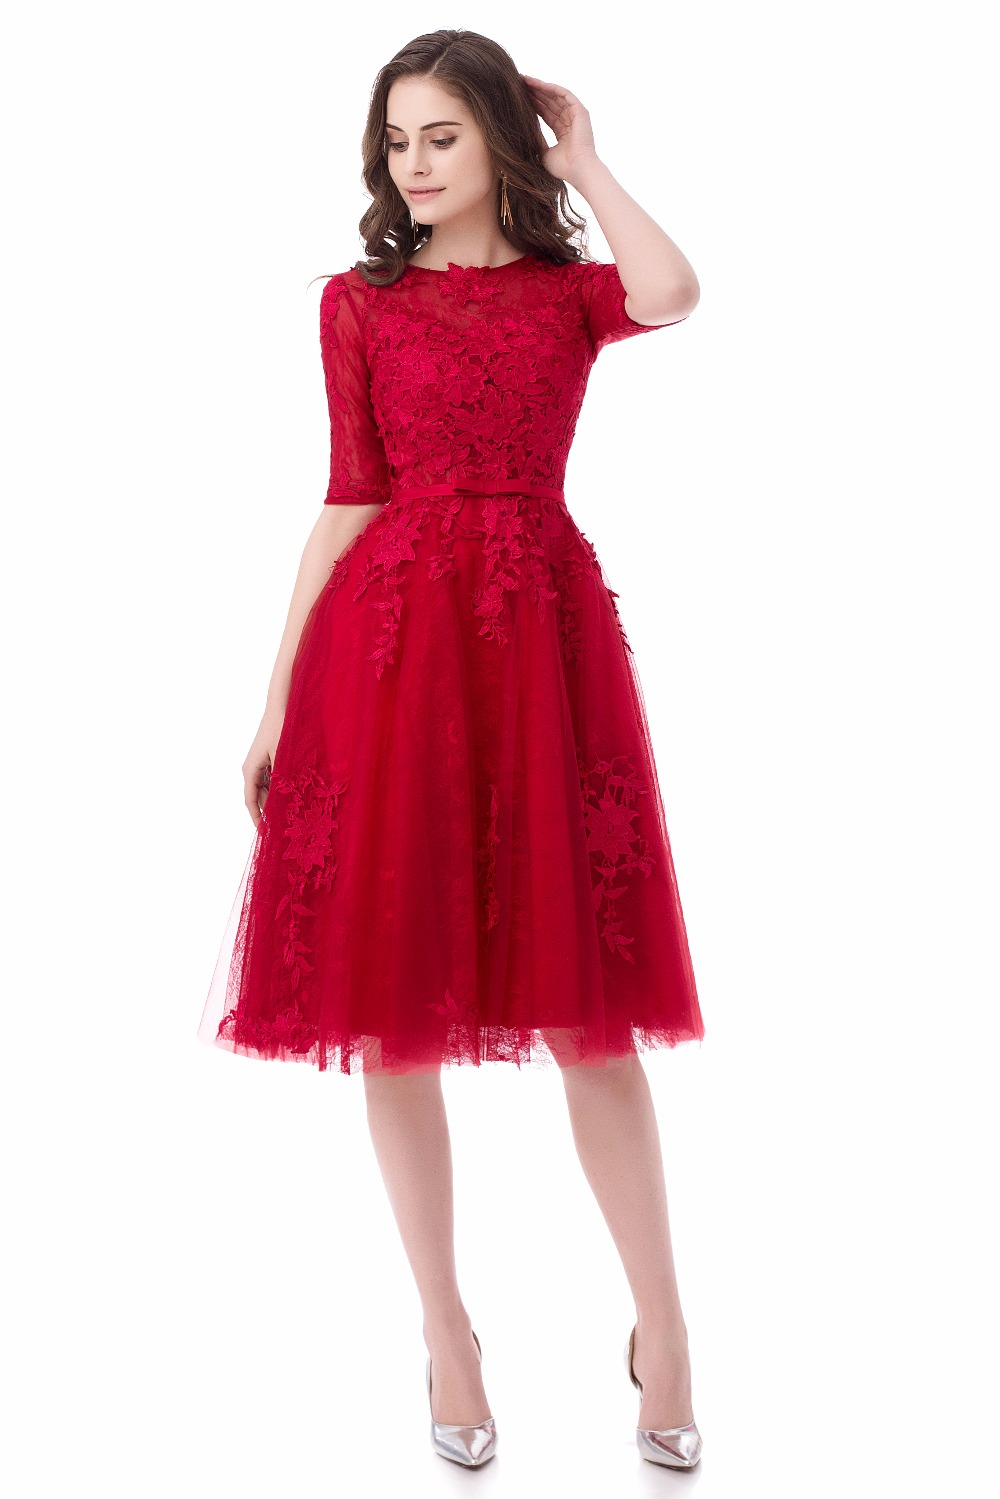 Short Evening Dresses A-Line Women Lace Appliques Robe De Soiree Half Sleeves Elegant Party Formal Prom Dress 2017 Abendkleider 6